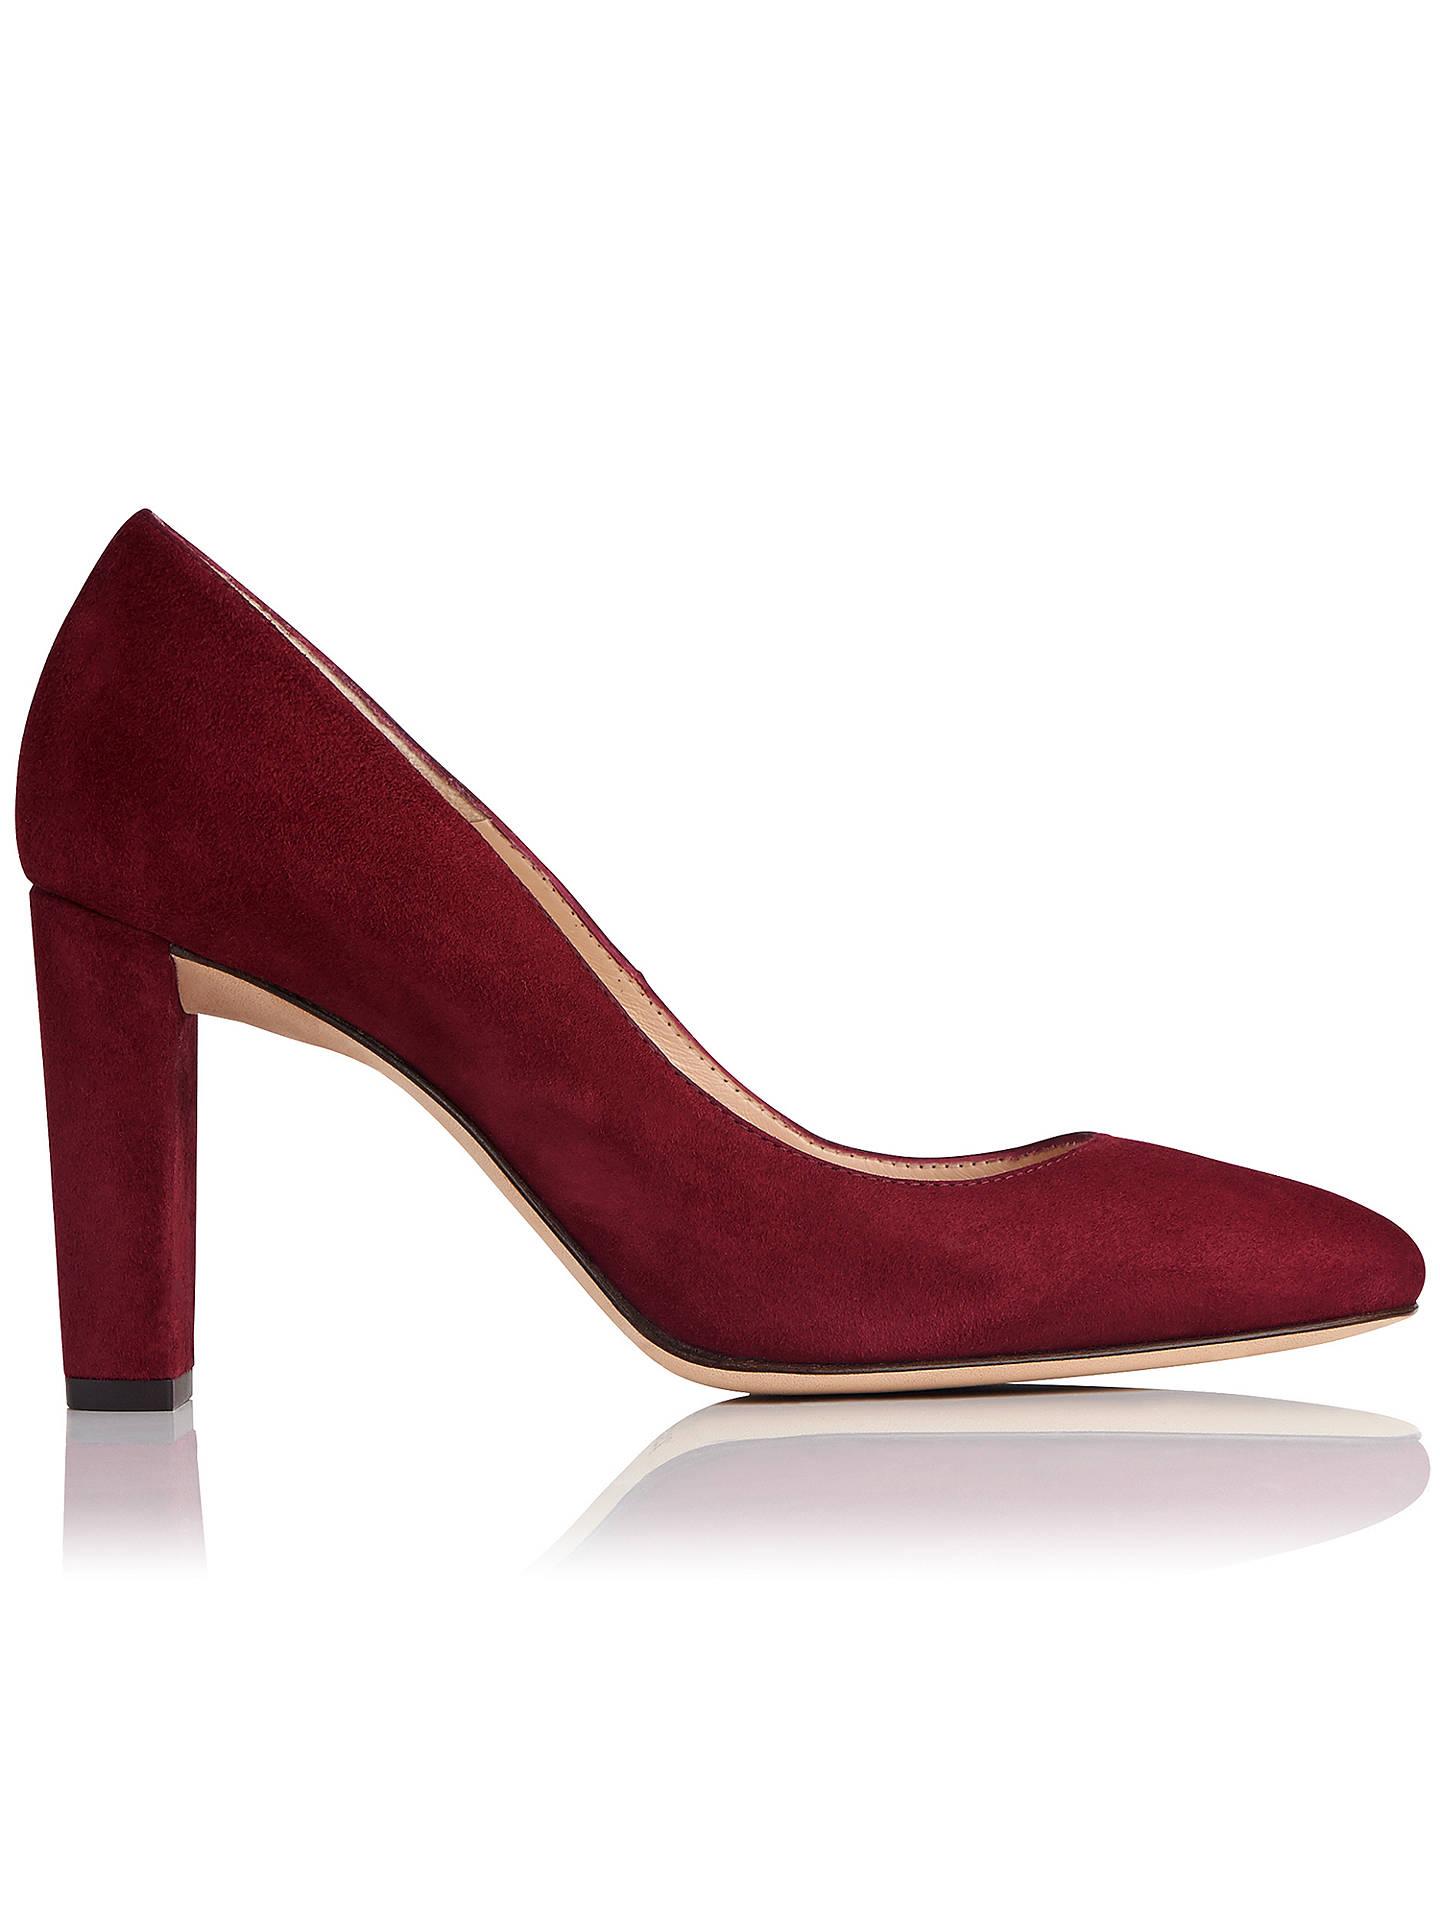 5adb905febf L.K. Bennett Marcella Closed Court Shoes at John Lewis   Partners